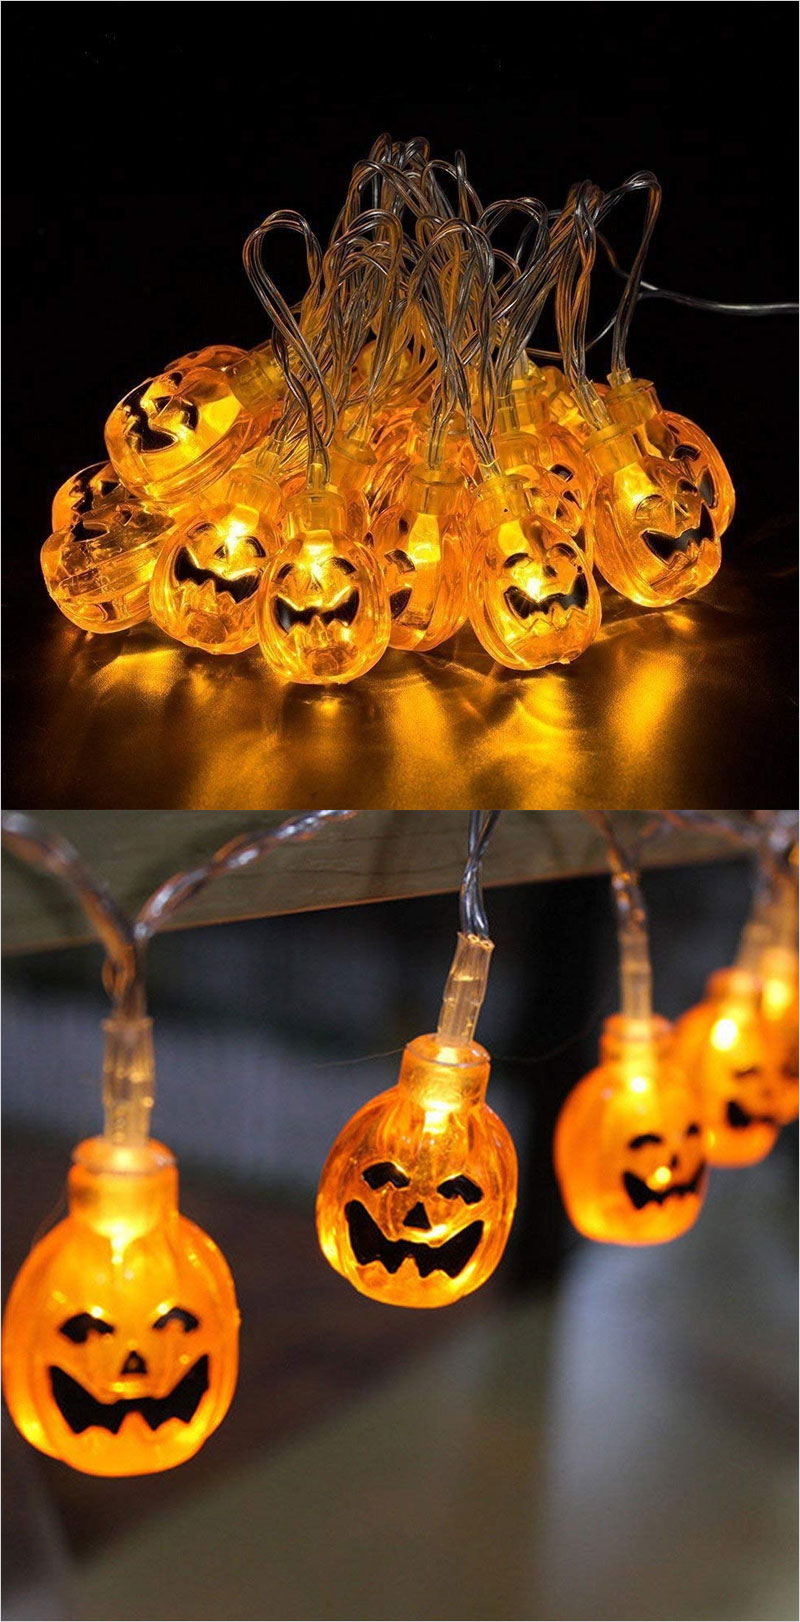 Pumpkins-String-Lights-30-LEDs-10.33-Foot-Halloween